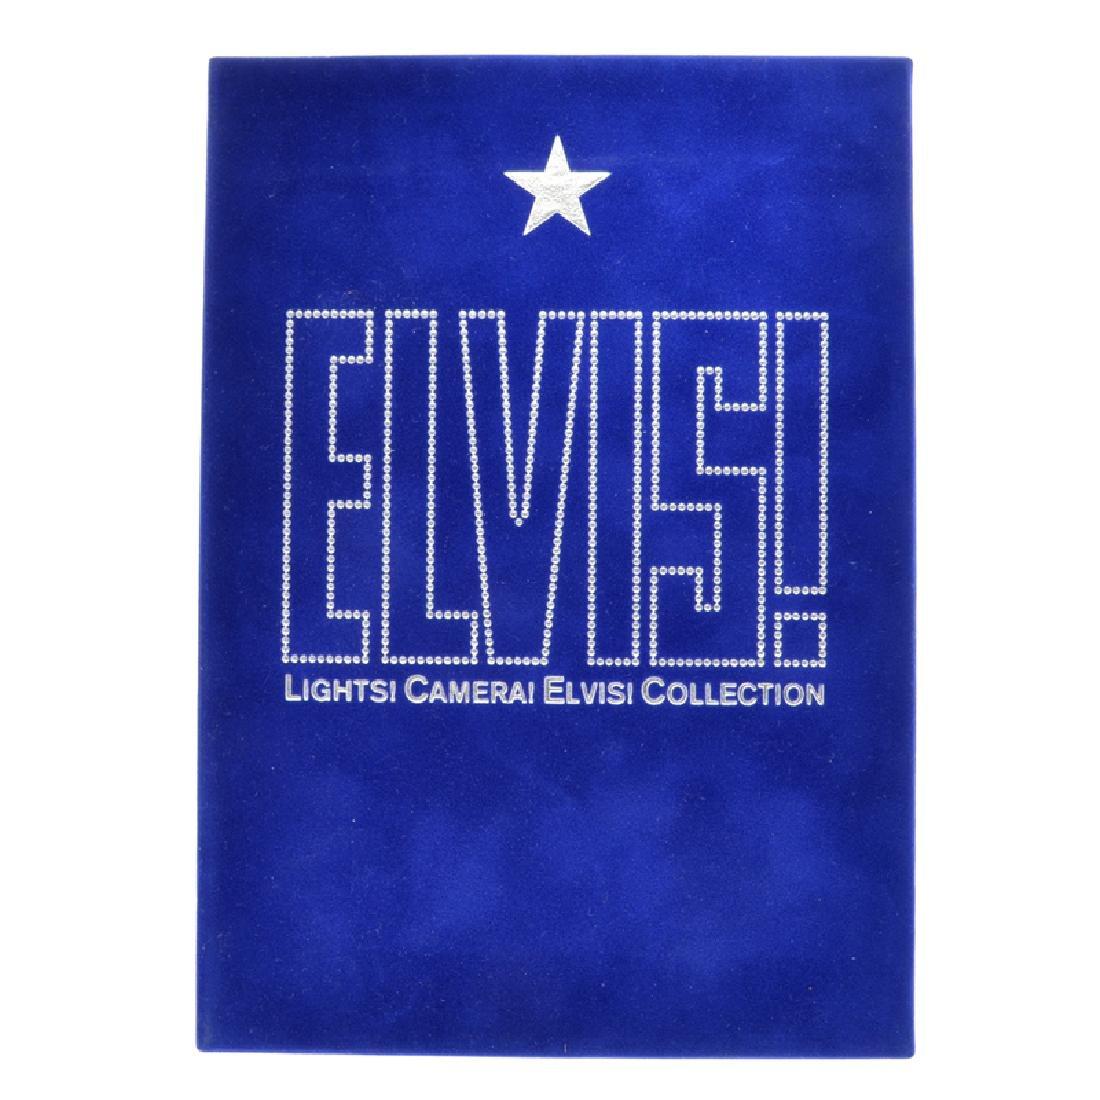 Elvis Presley Movie: Lights! Camera! Elvis! Collection,